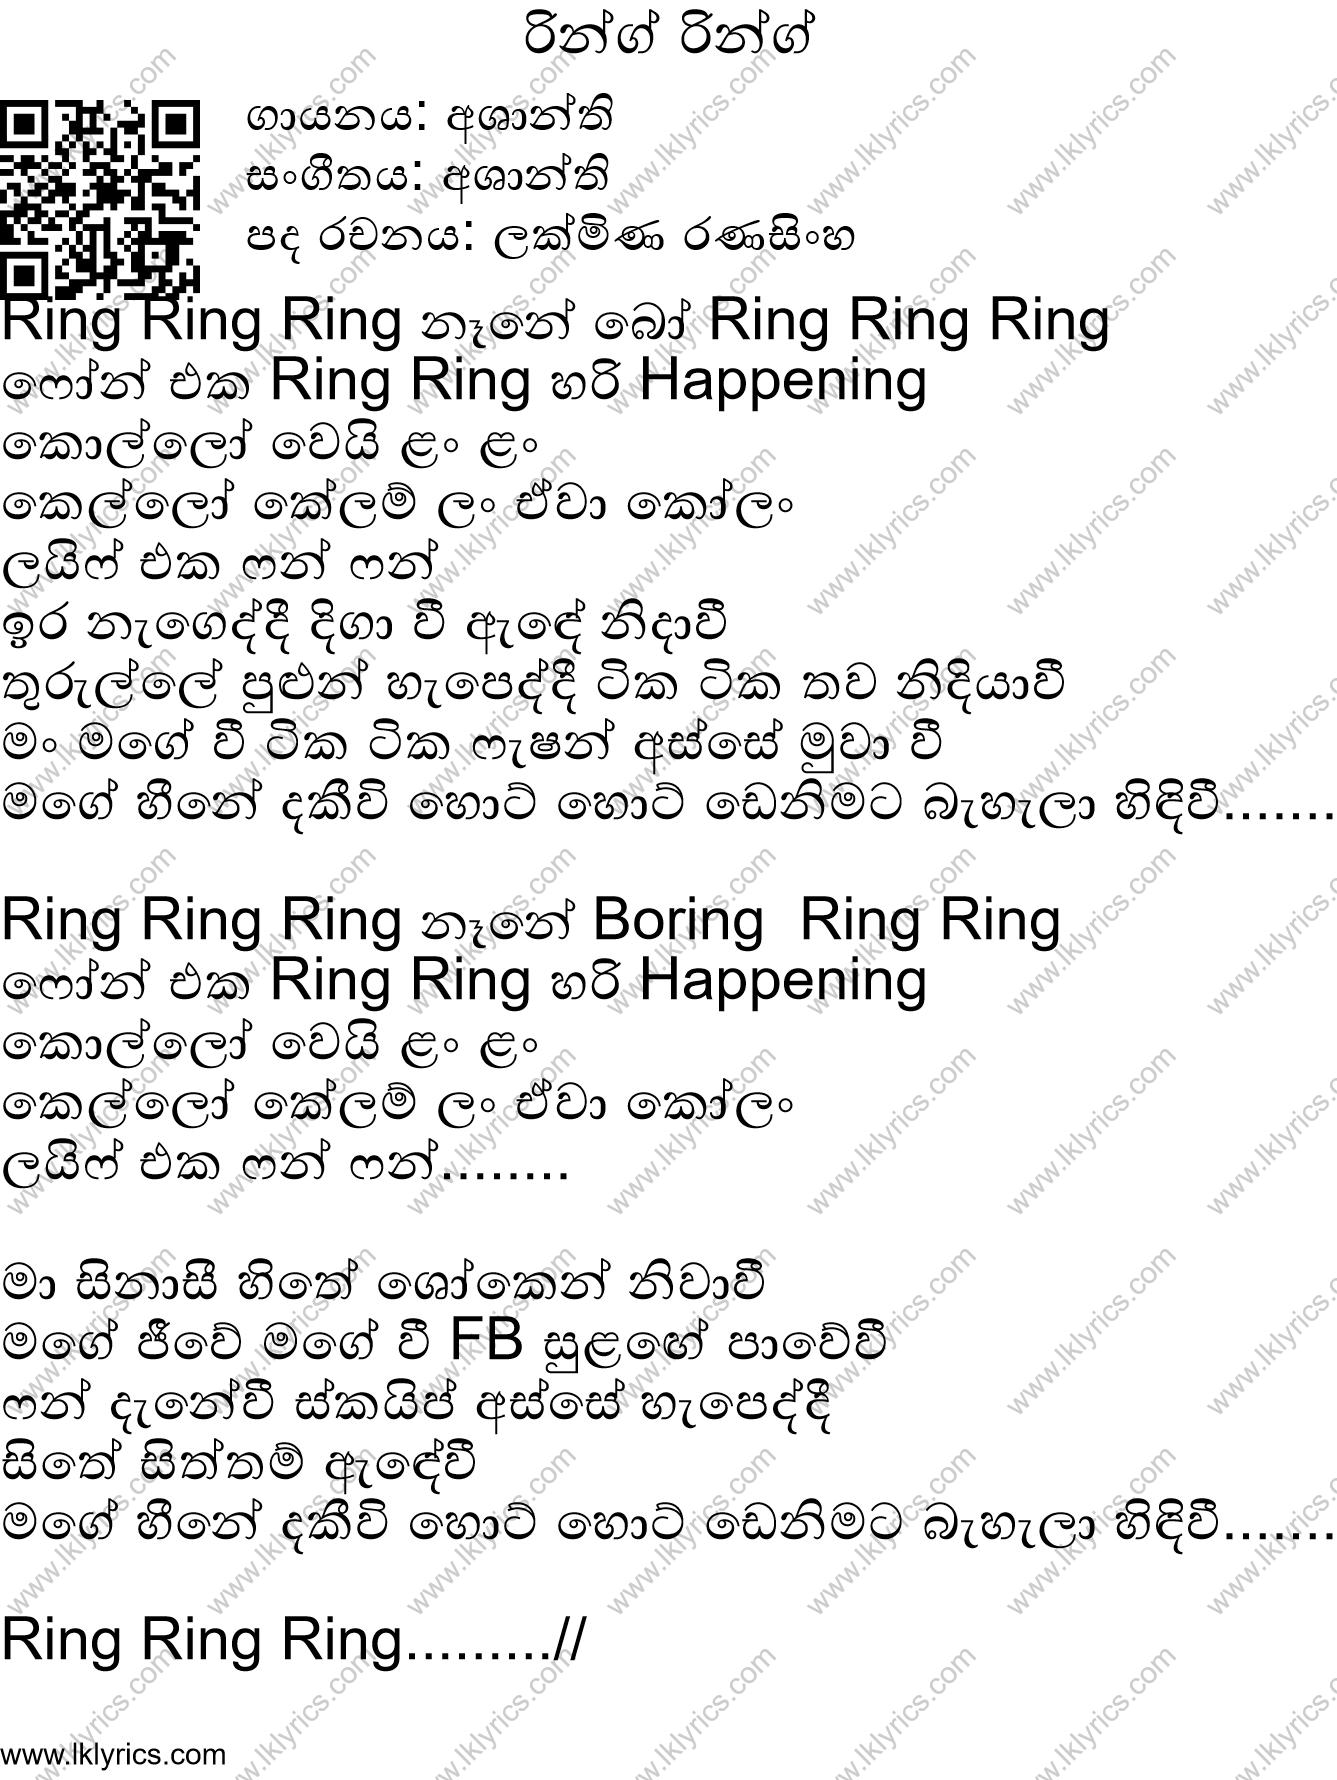 Ring Ring Ring නෑනේ බෝ Ring Ring Ring ෆෝන් එක Ring Ring හරි Happening කොල්ලෝ වෙයි ළං ළං කෙ...